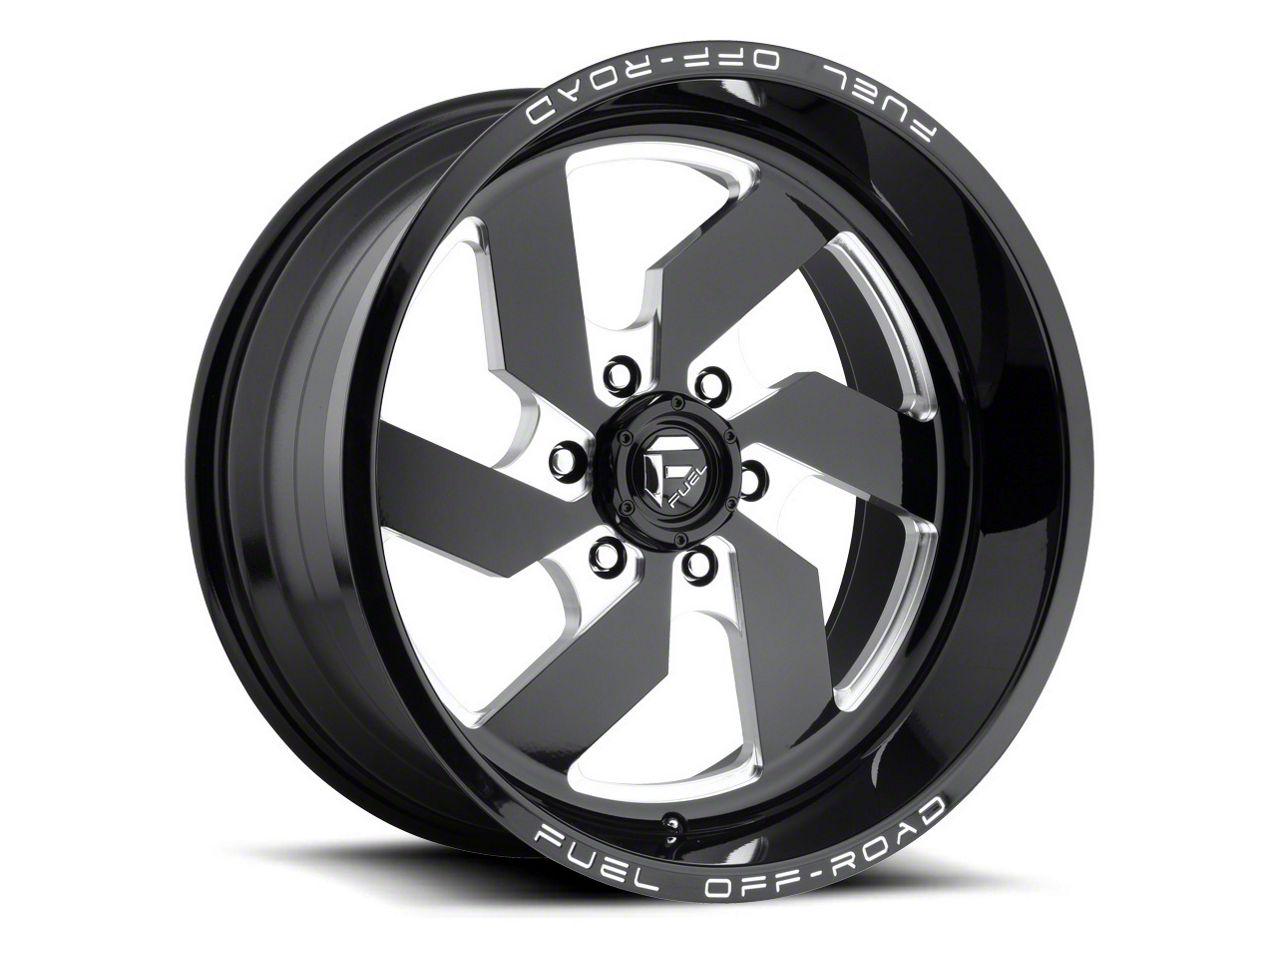 Fuel Wheels Turbo Black Milled 6-Lug Wheel - 20x10 (04-19 F-150)